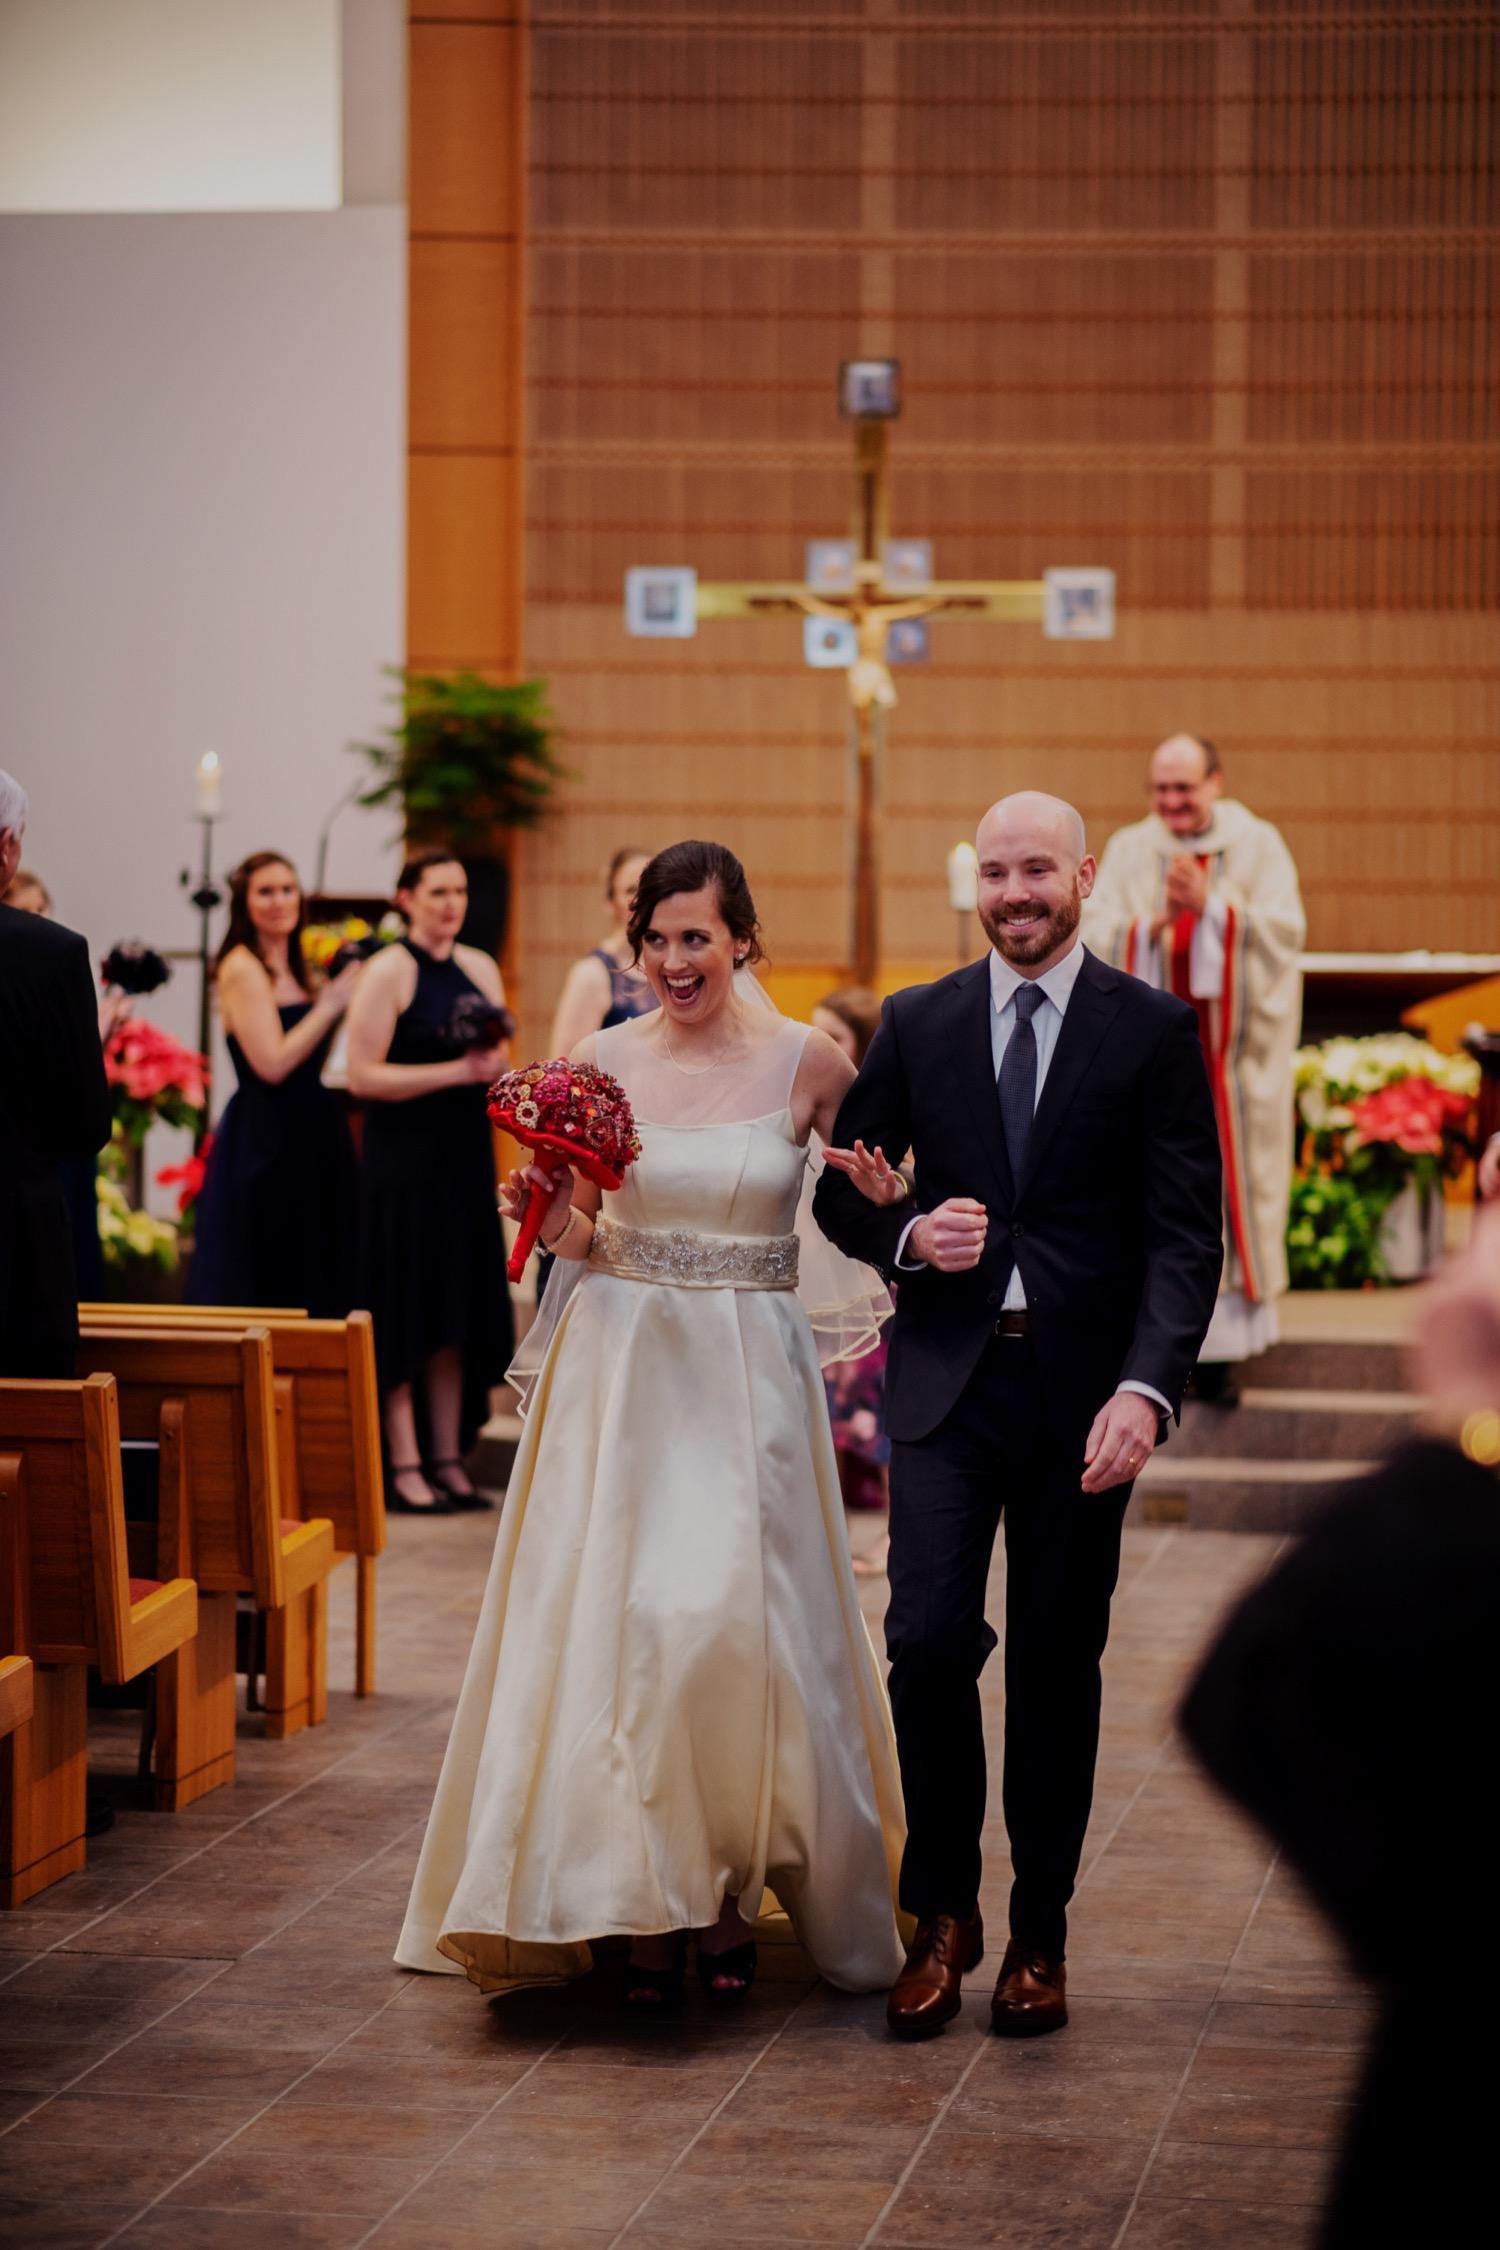 053_McGrath-Libertyville-IndependenceGrove-Winter-Wedding_0075.jpg